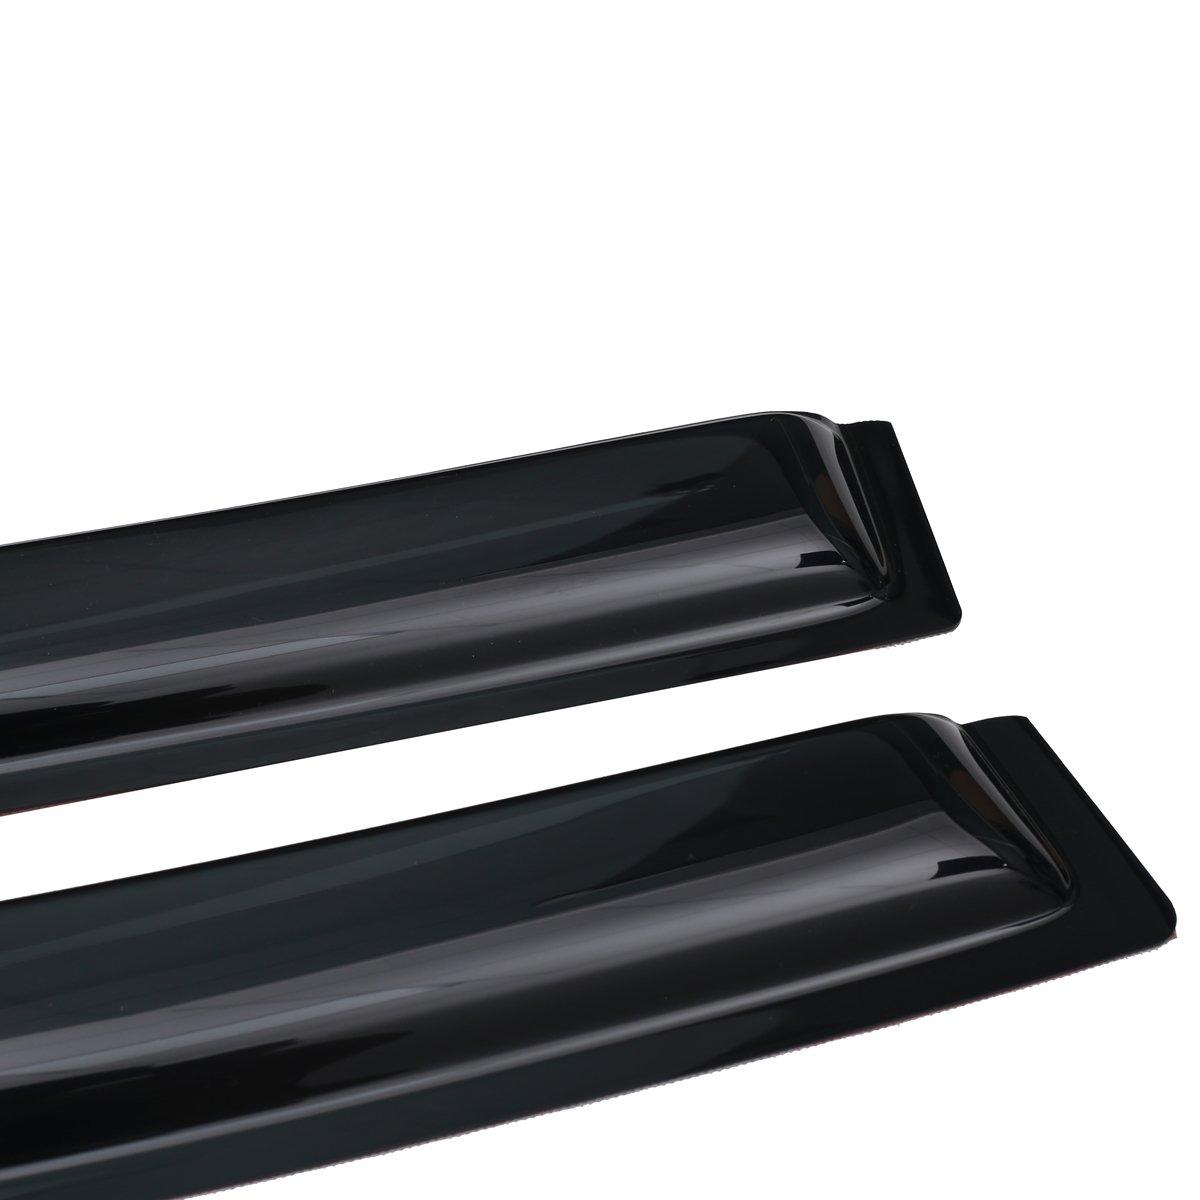 Lightronic Vent Visor Side Window Deflector Rain/Guards/2-Piece Set for 2009-2018 Dodge Ram 1500,2010-2018/Dodge/Ram/2500/&3500 Standard Cab Pickup,2019 Ram 1500 Classic Standard Cab Pickup